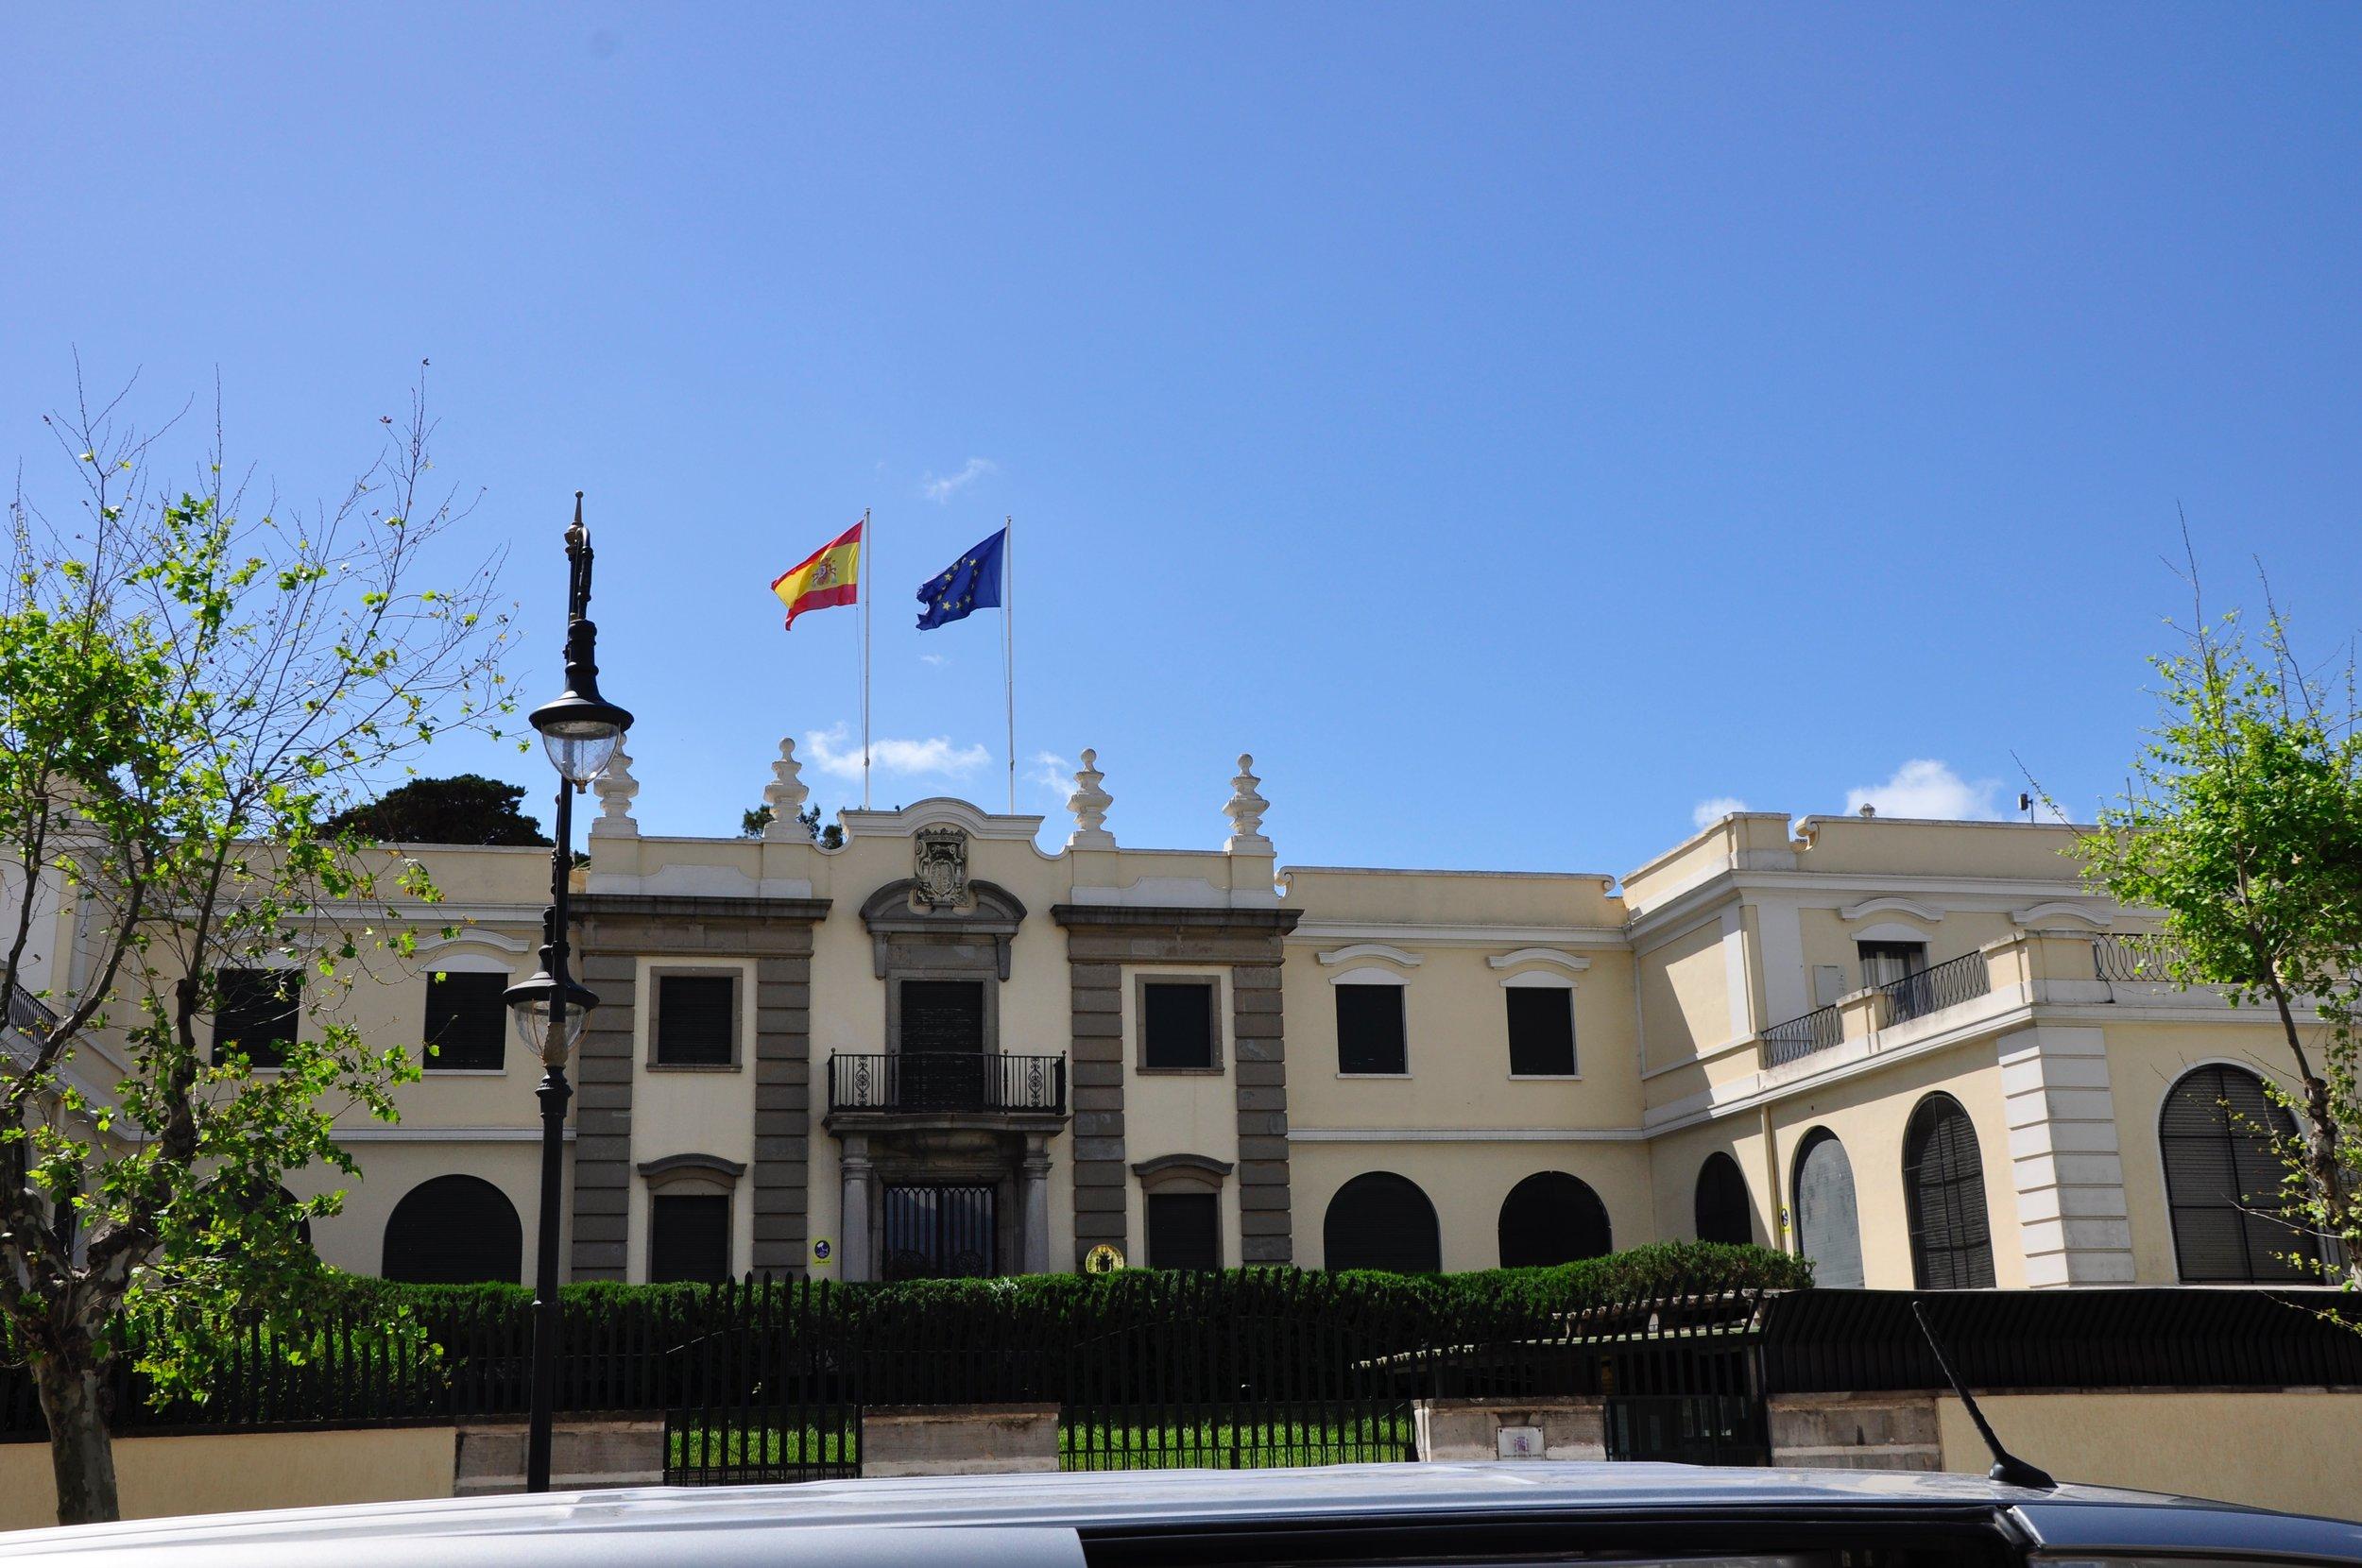 Elegant embassies